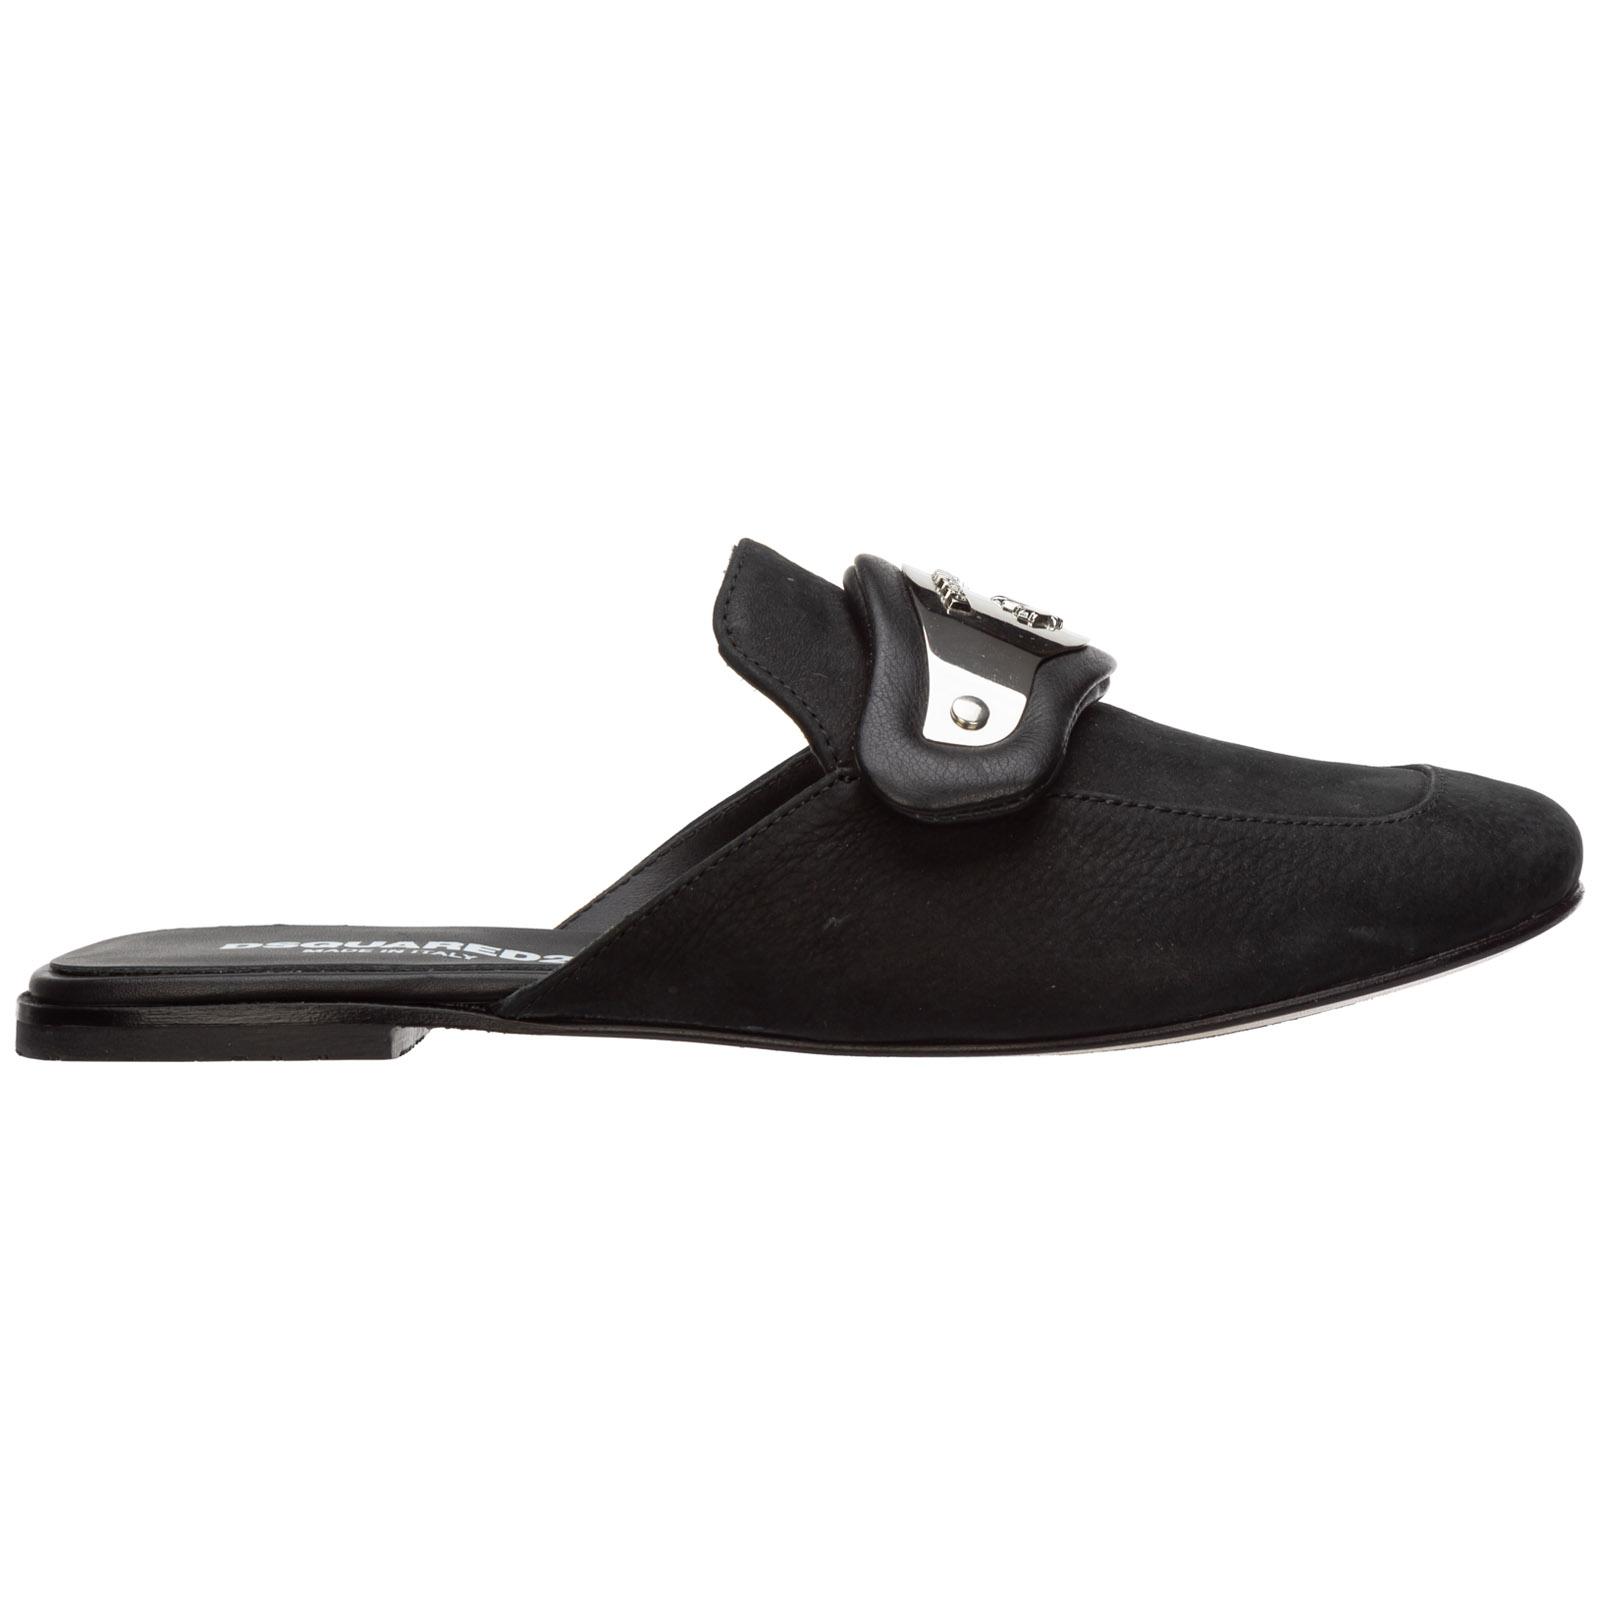 Mules shoes Dsquared2 59768 nero | FRMODA.com